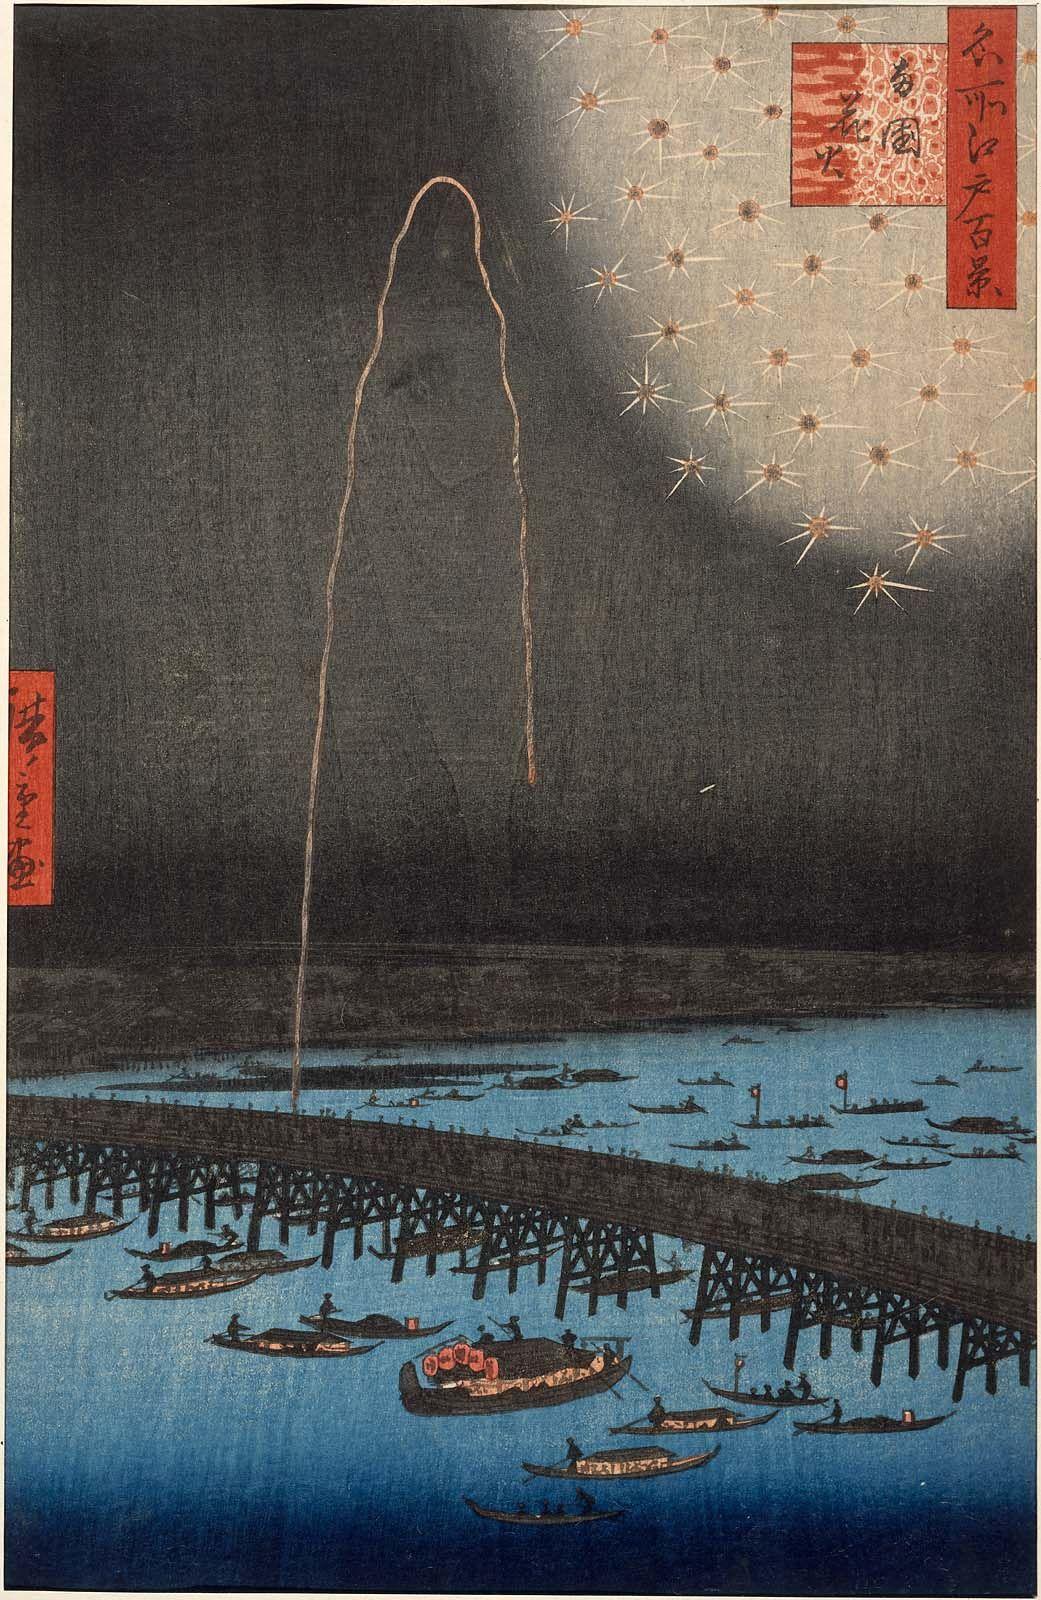 Utagawa Hiroshige Fireworks at Ryôgoku (Ryôgoku hanabi)